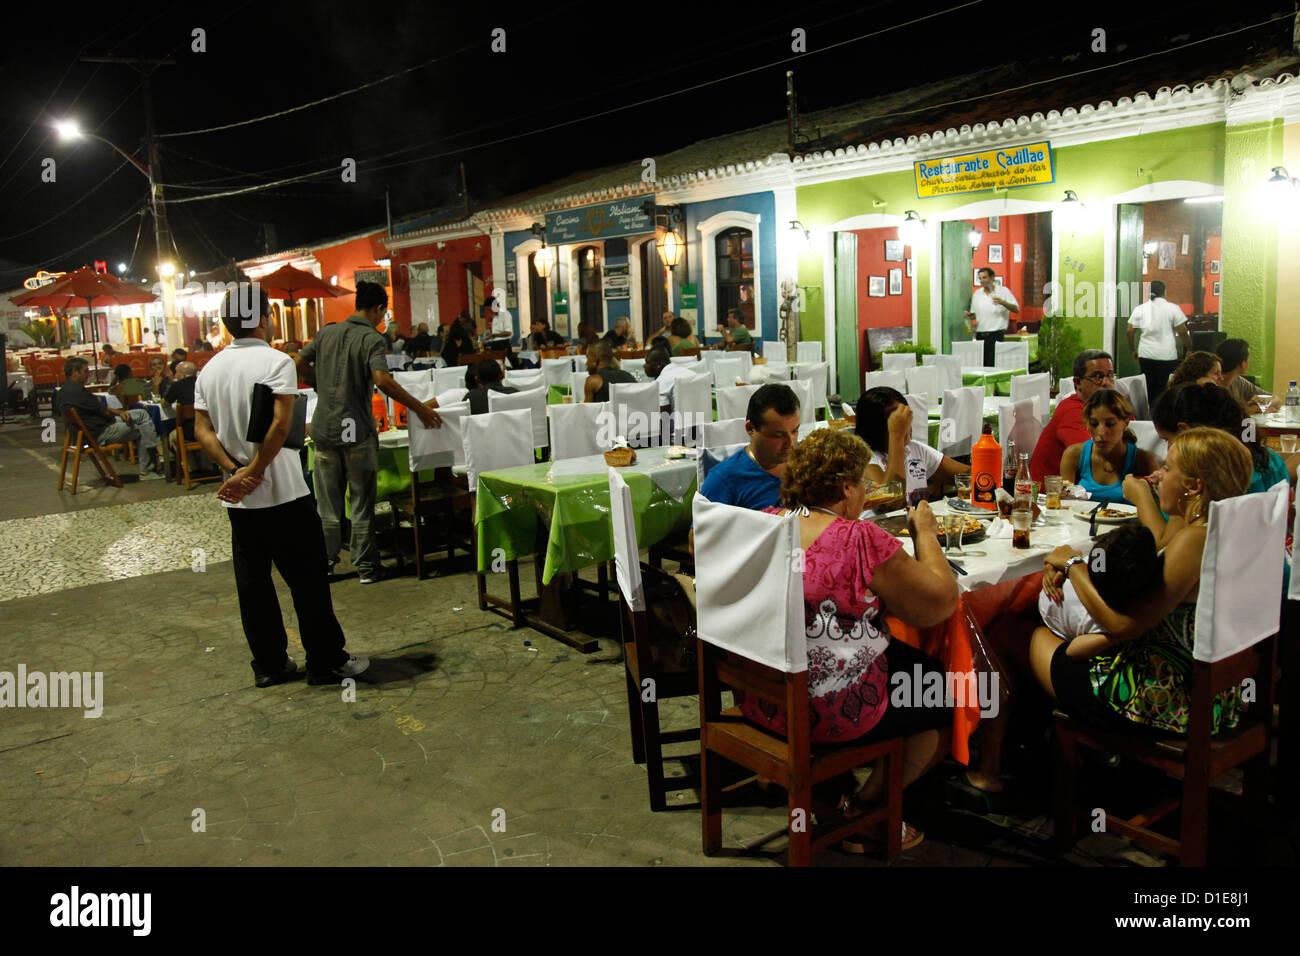 People sitting at outdoor restaurants in Porto Seguro, Bahia, Brazil, South America - Stock Image